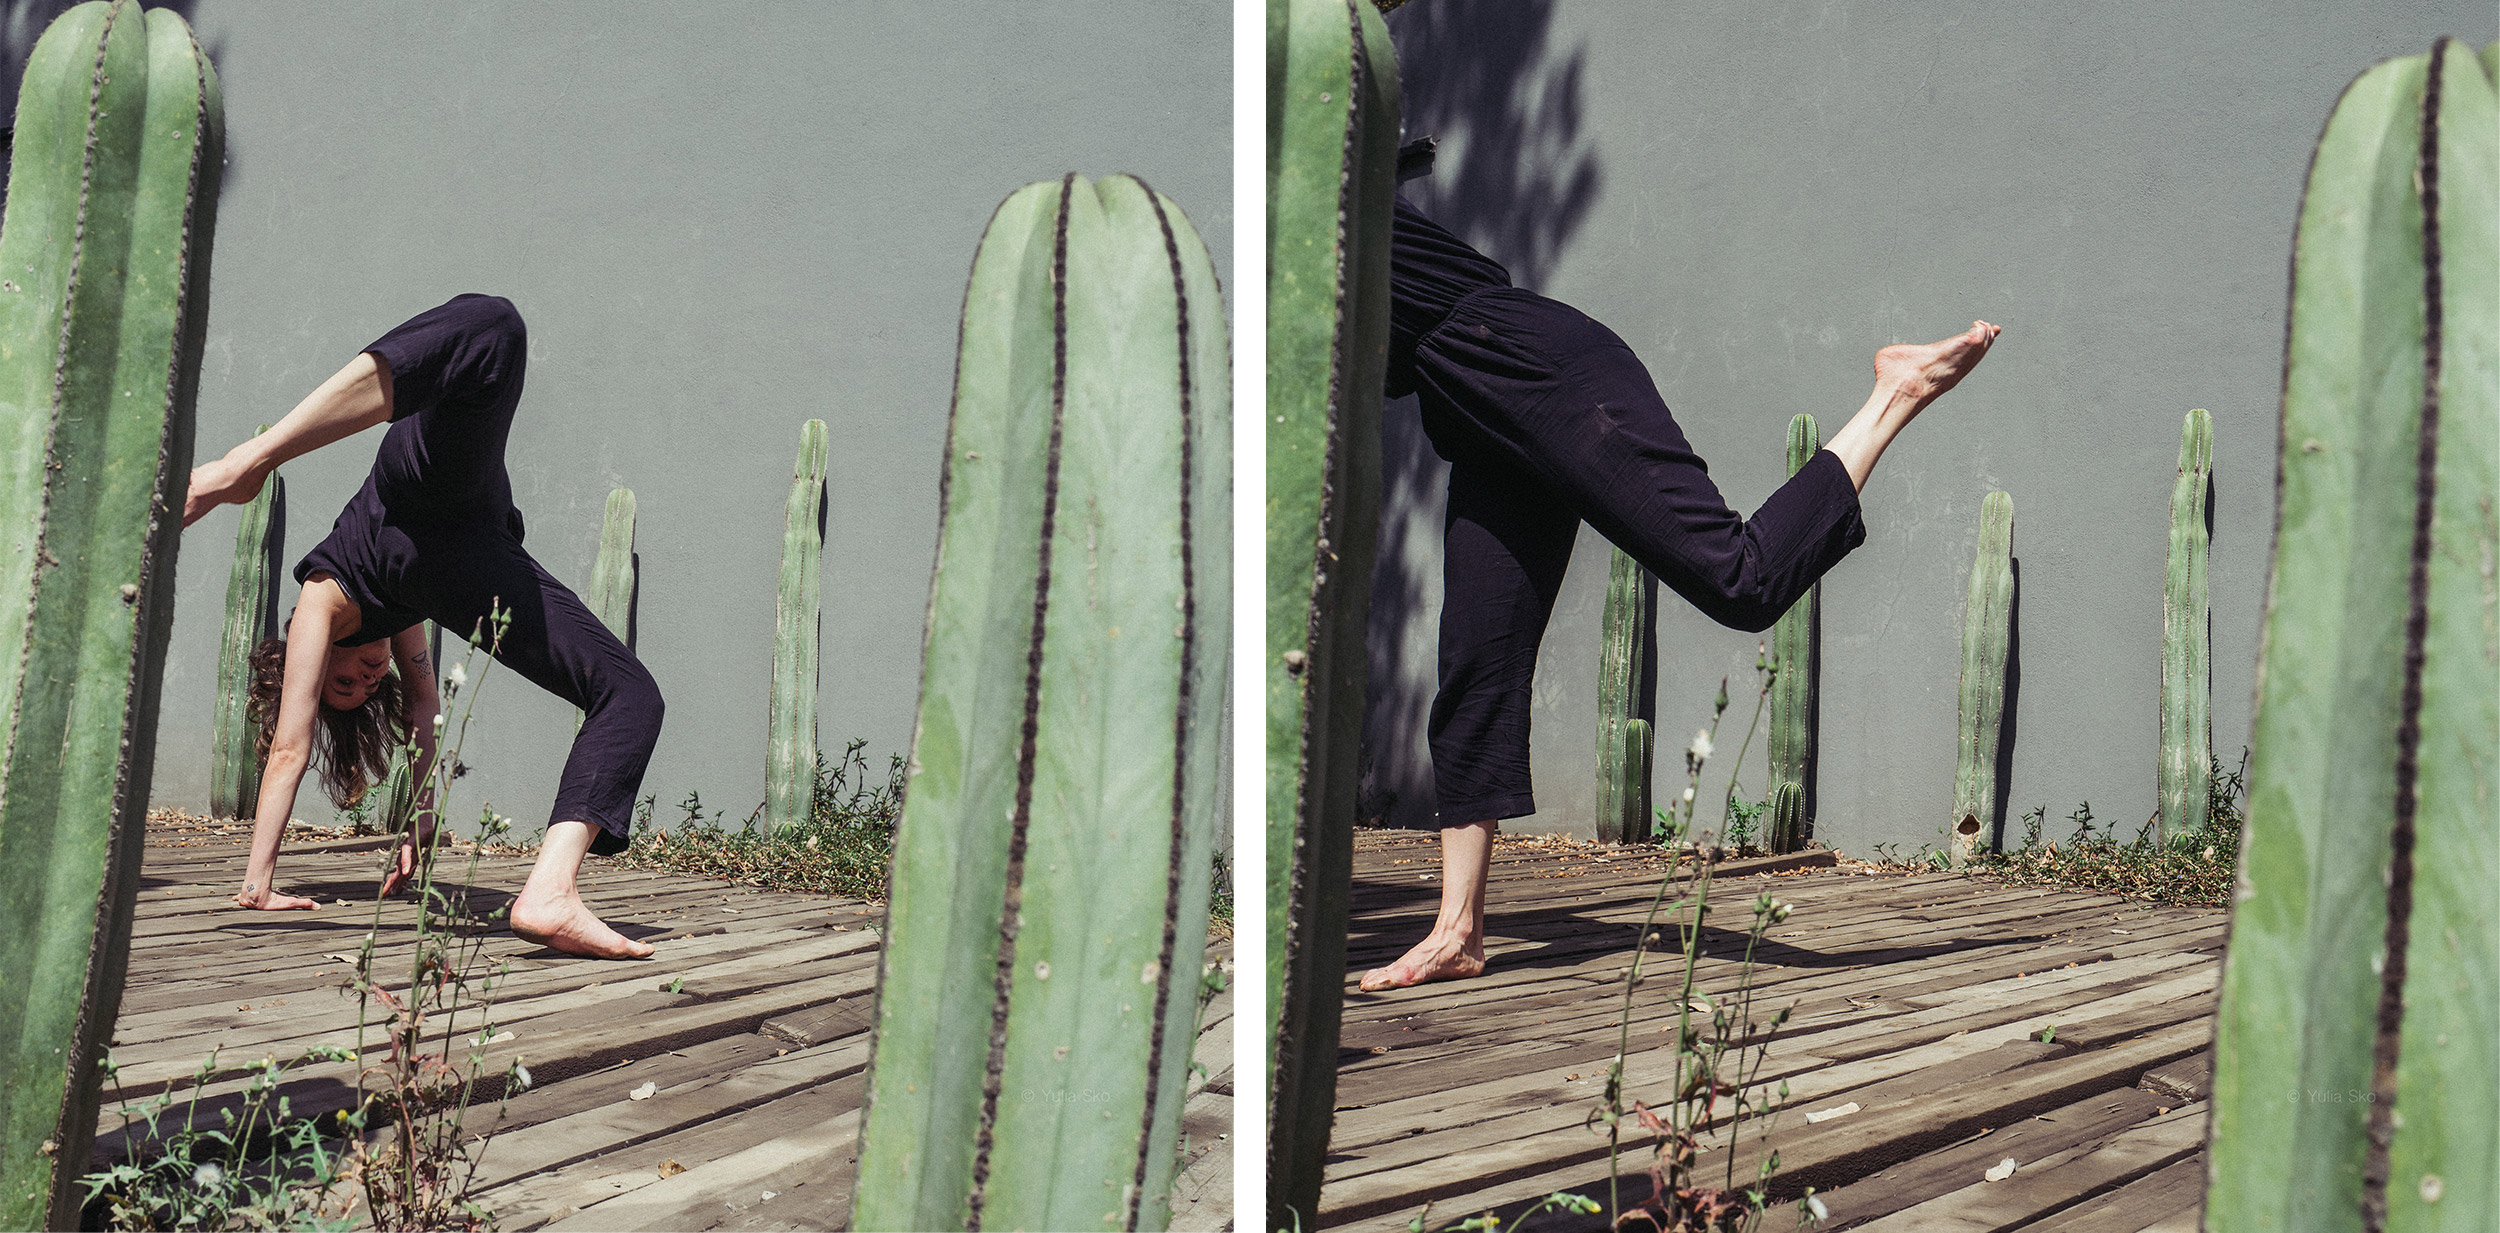 Cactus dance in Mexico: collaboration with Mariana Garcia Garza